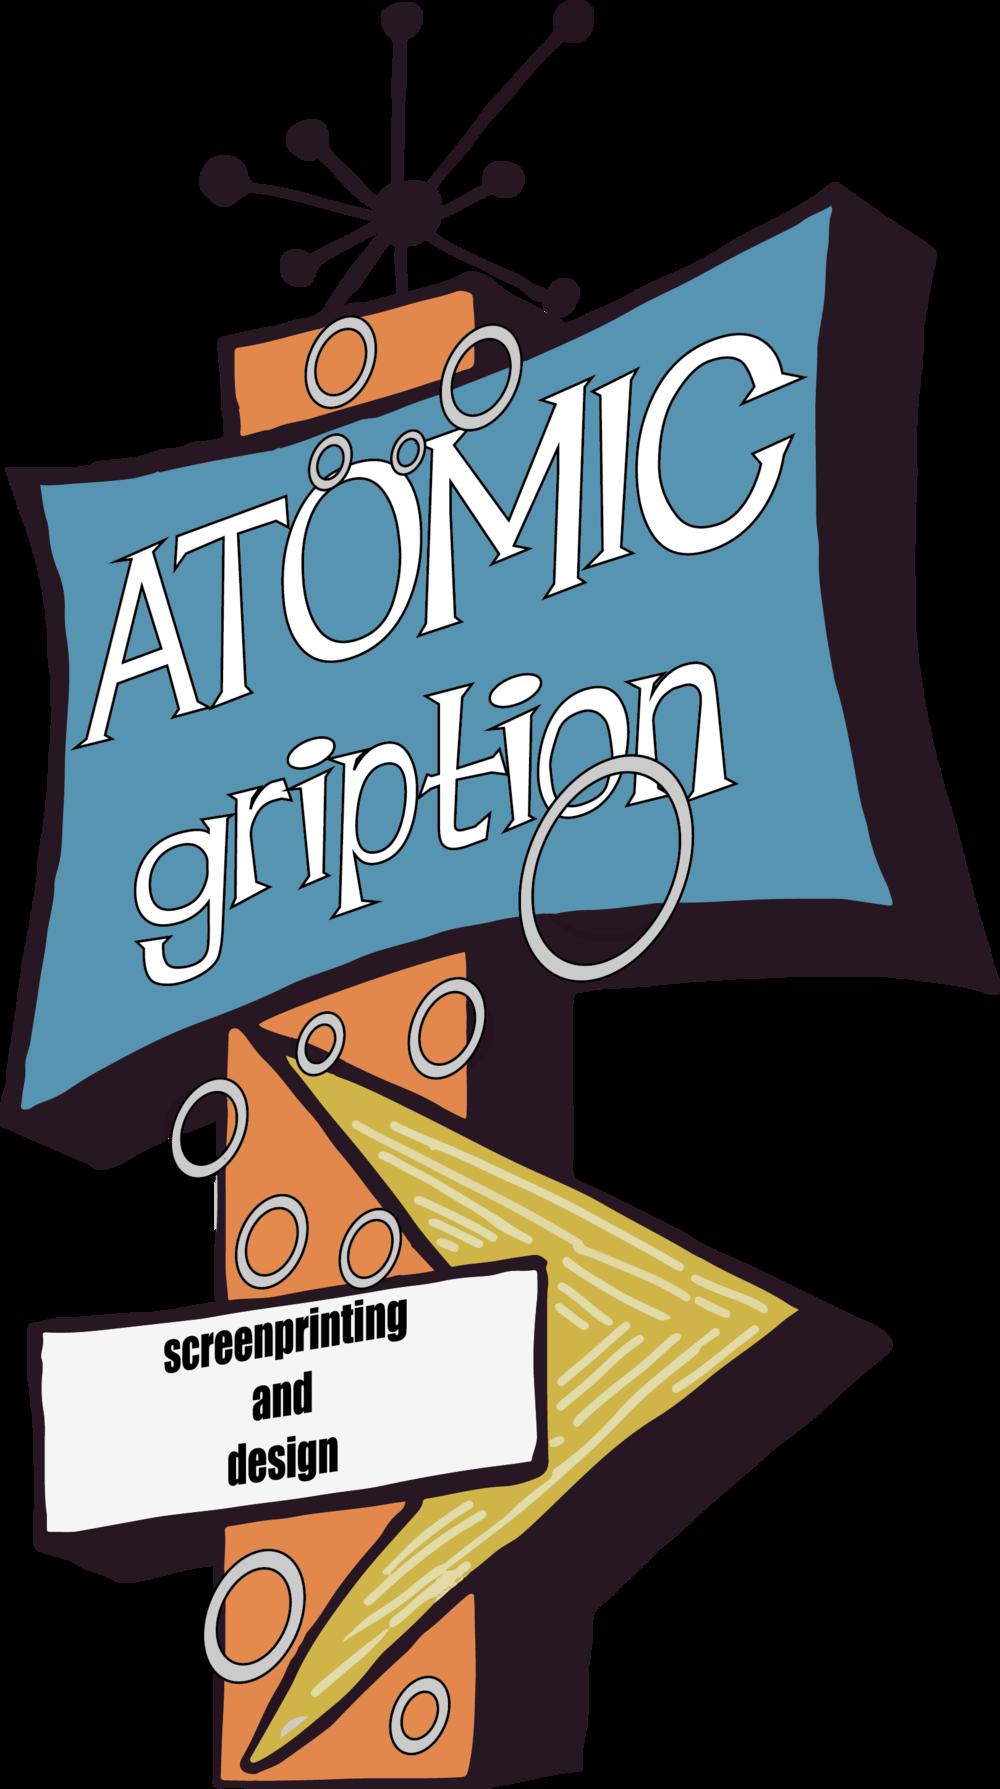 For Atomic Gription